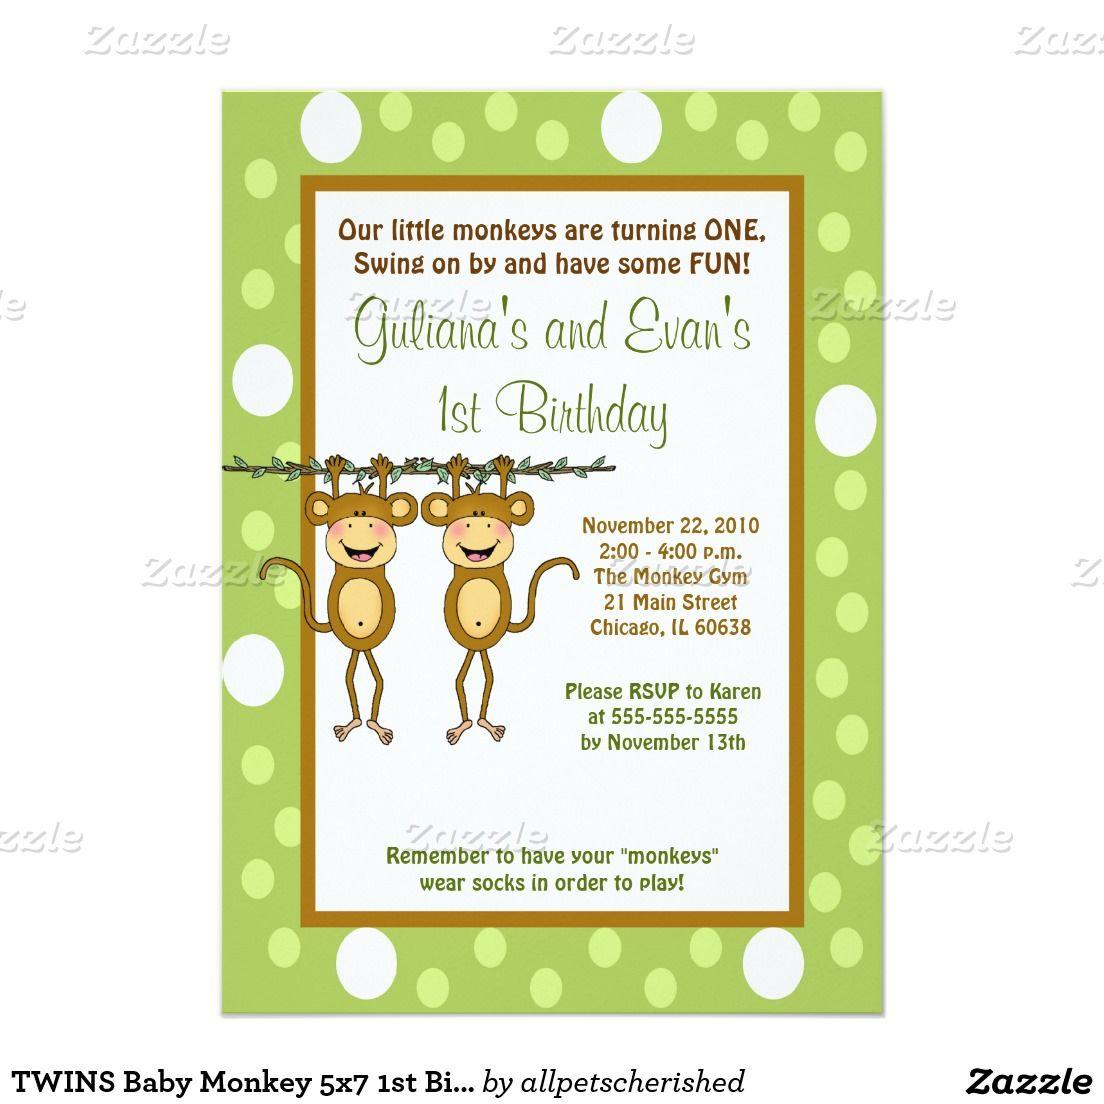 TWINS Baby Monkey 5x7 1st Birthday Invitation | 1st Bday Ideas ...